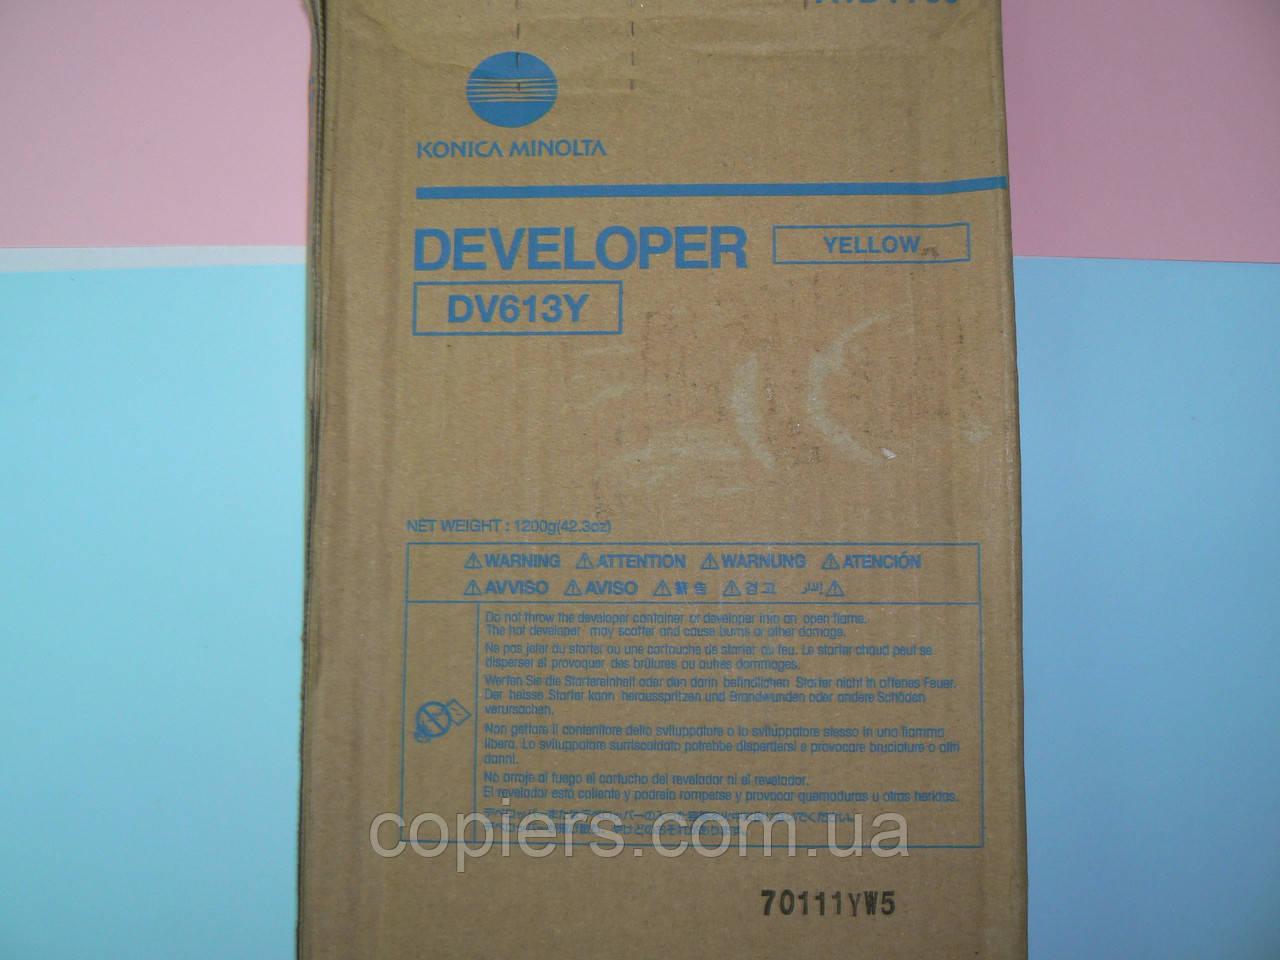 Developer DV613Y Konica Minolta Bizhub PRESS C8000